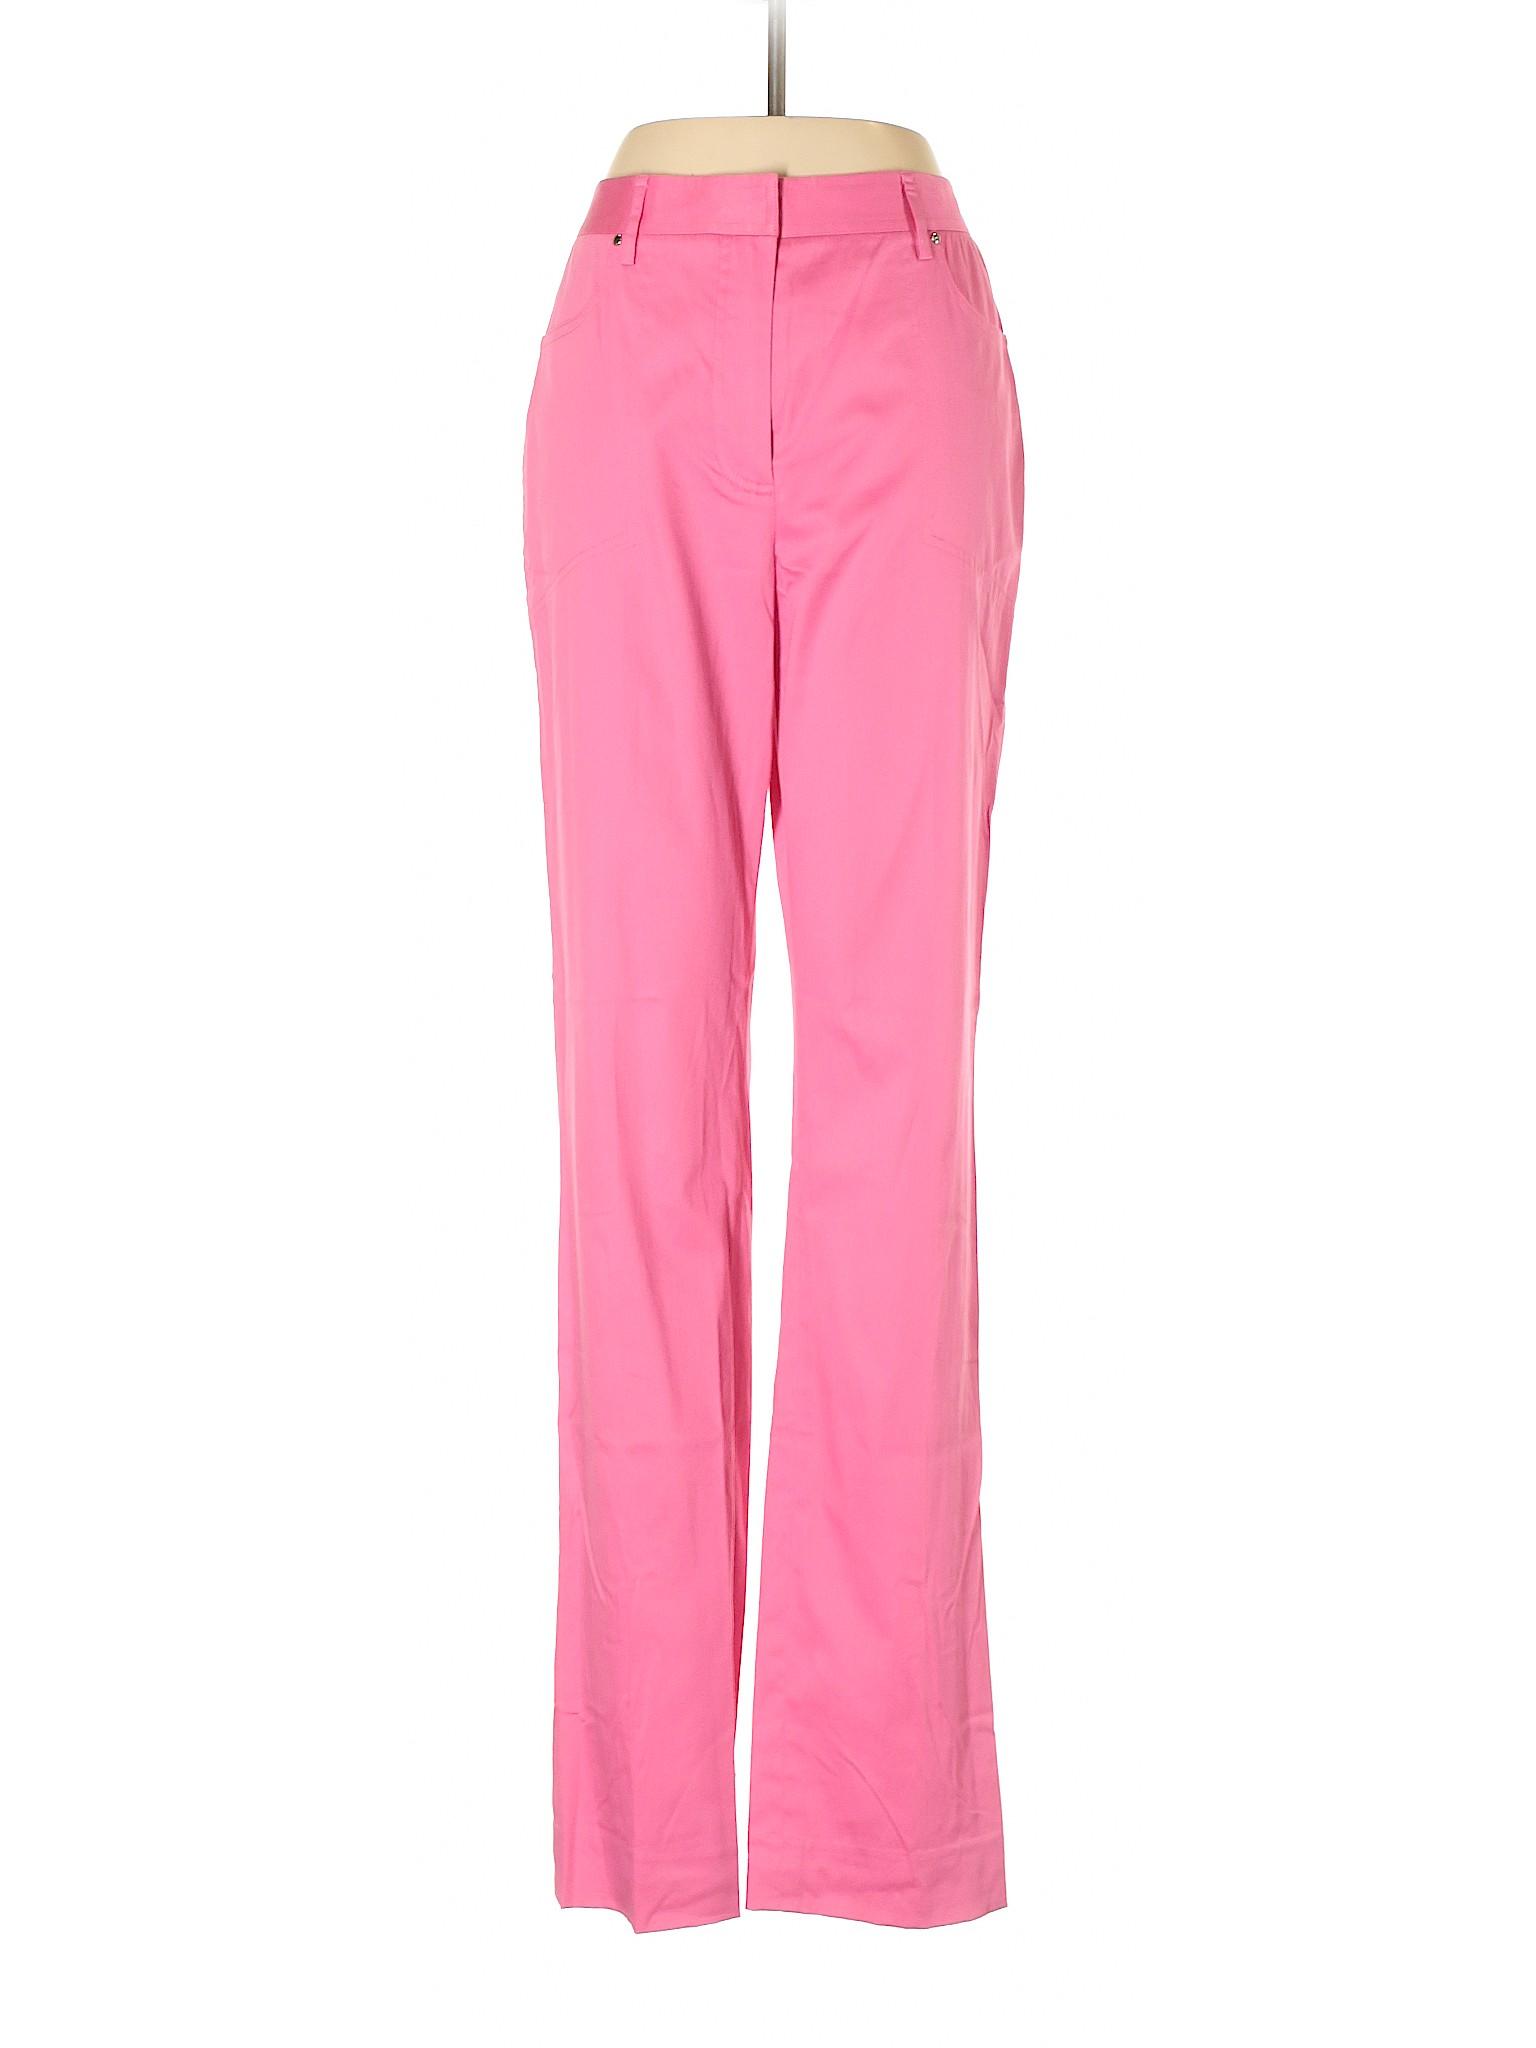 Boutique Boutique Casual winter Carlisle Casual Pants Pants Boutique winter Carlisle pCwqxH45